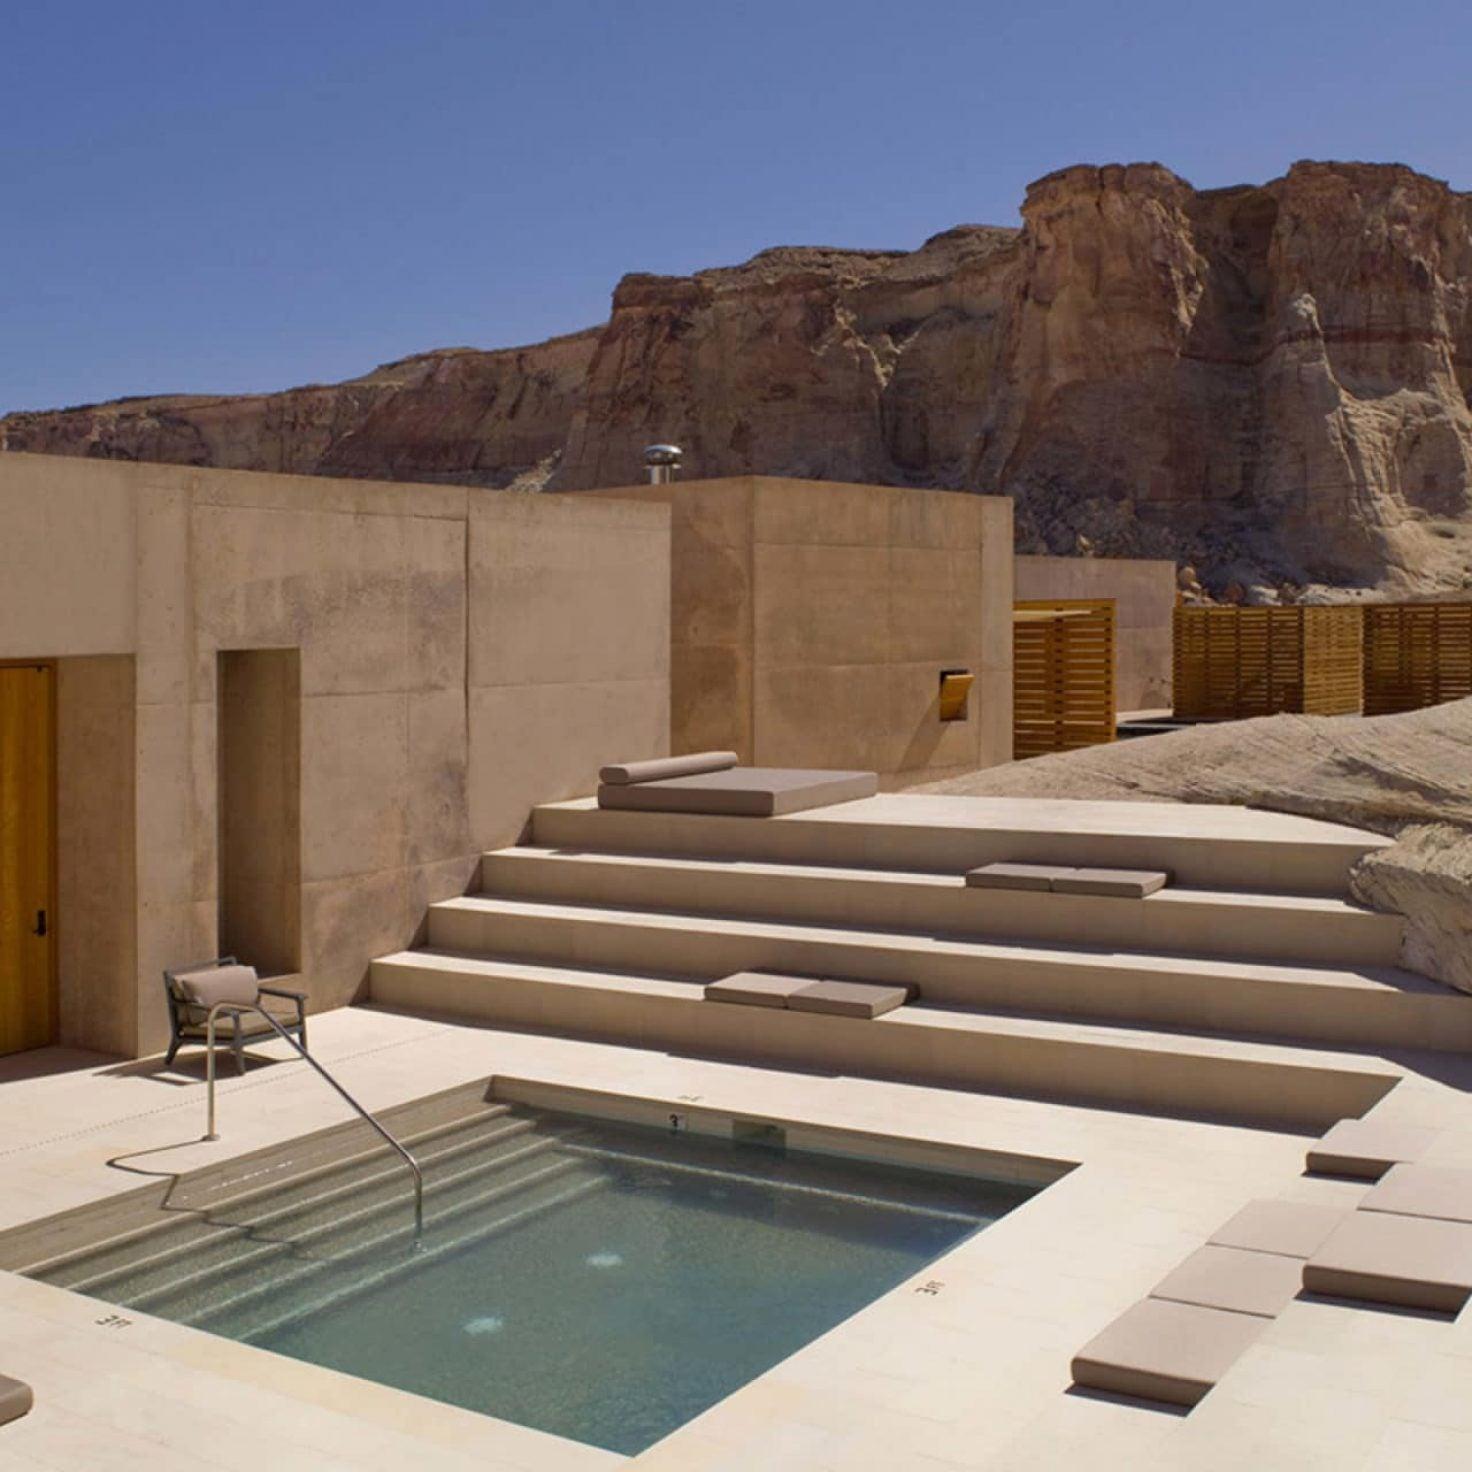 Take A Peek Inside The Luxe Utah Resort Where Idris Elba's Fiancée Threw Her Bachelorette Party